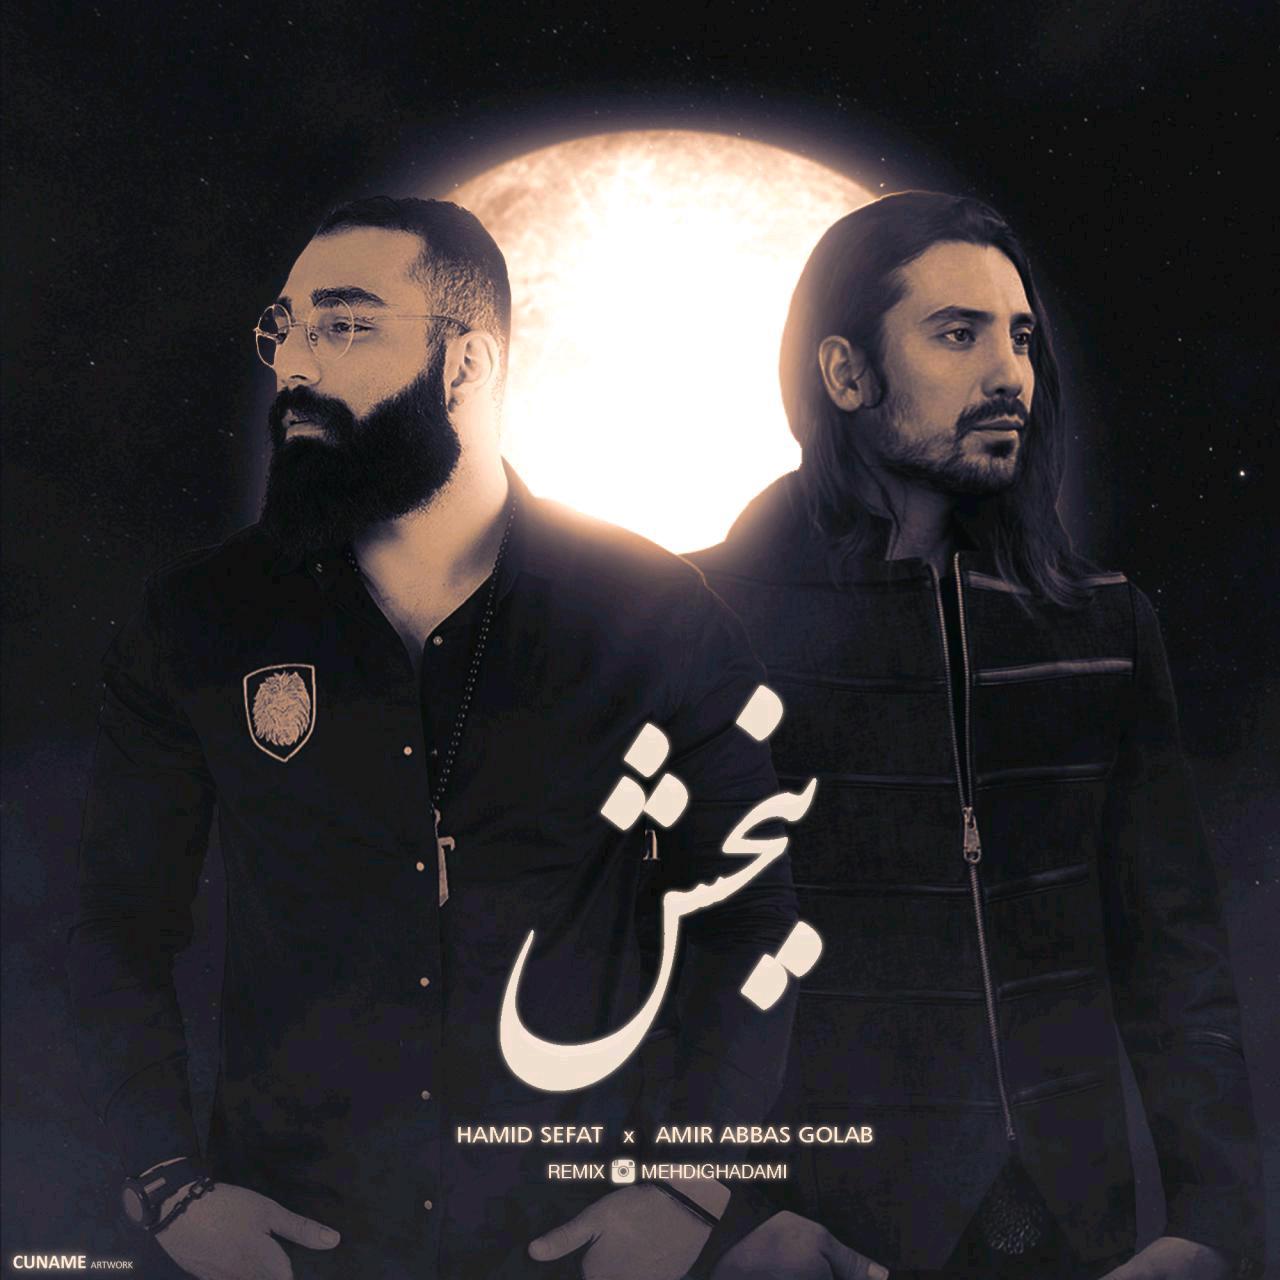 Amirabbas Golab – Bakhshesh New Version (Ft Hamid Sefat)